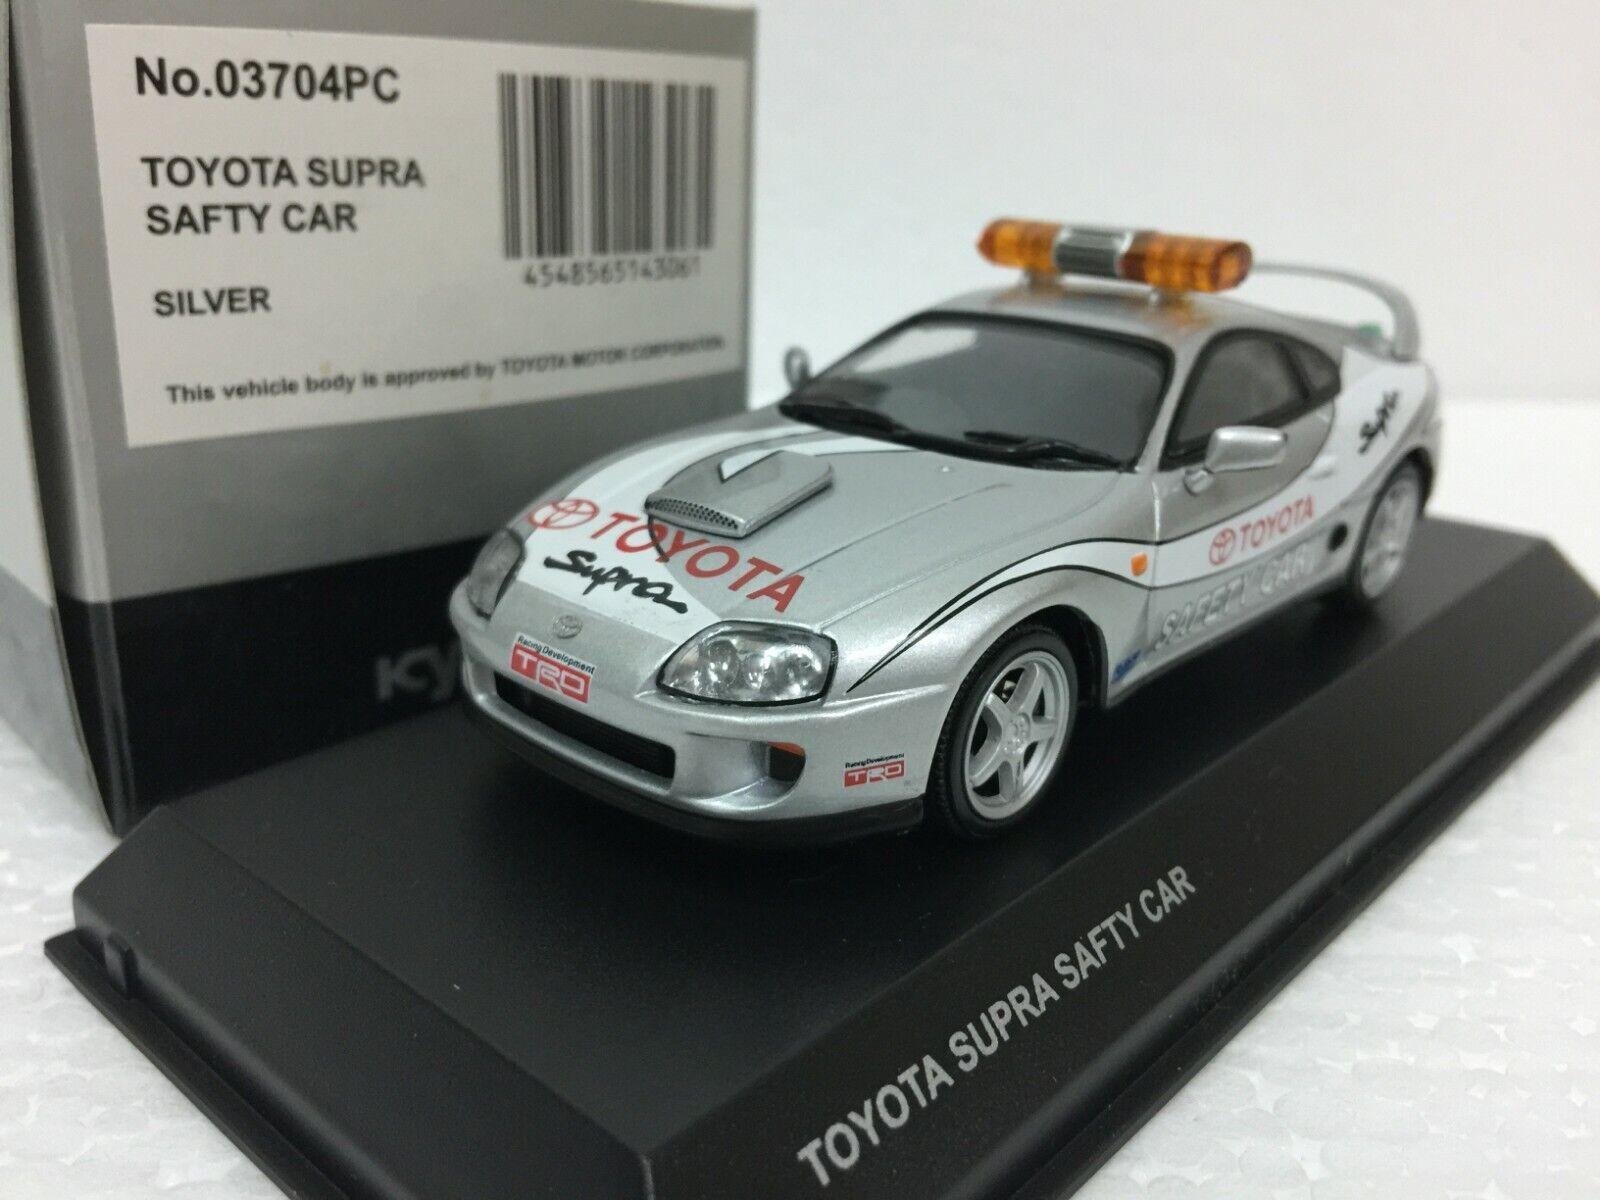 1 43 KYOSHO TOYOTA SUPRA TURBO JZA80 PACE CAR SAFETY CAR model car